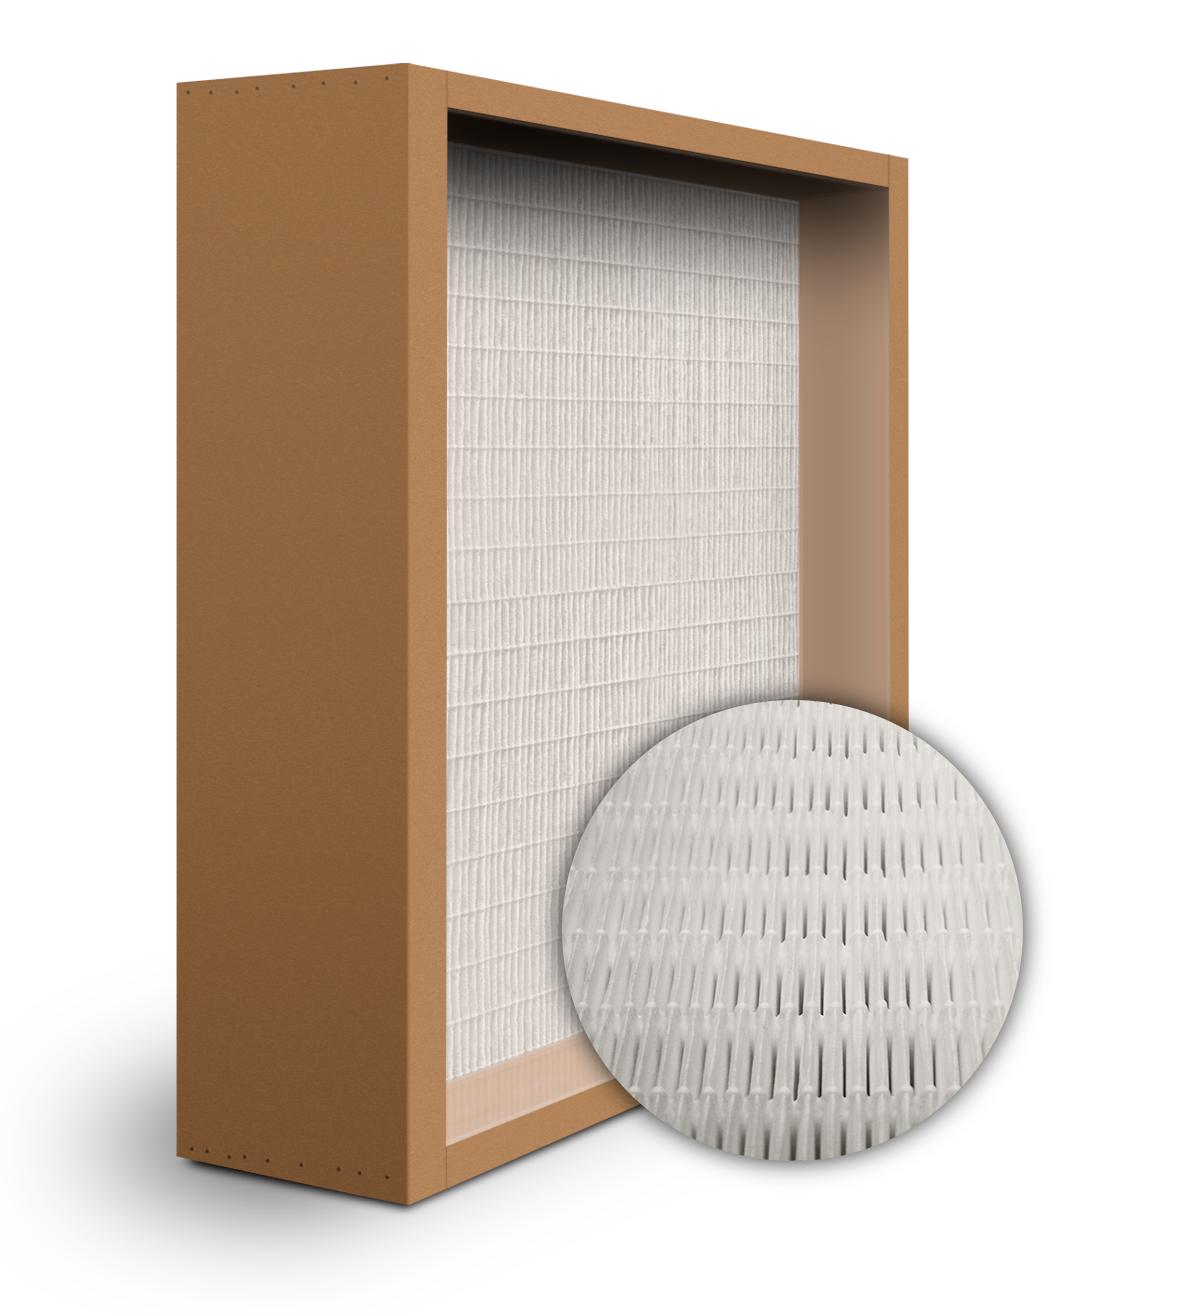 SuperFlo Max ASHRAE 95% (MERV 14/15) Particle Board Frame Mini Pleat Filter 20x25x6